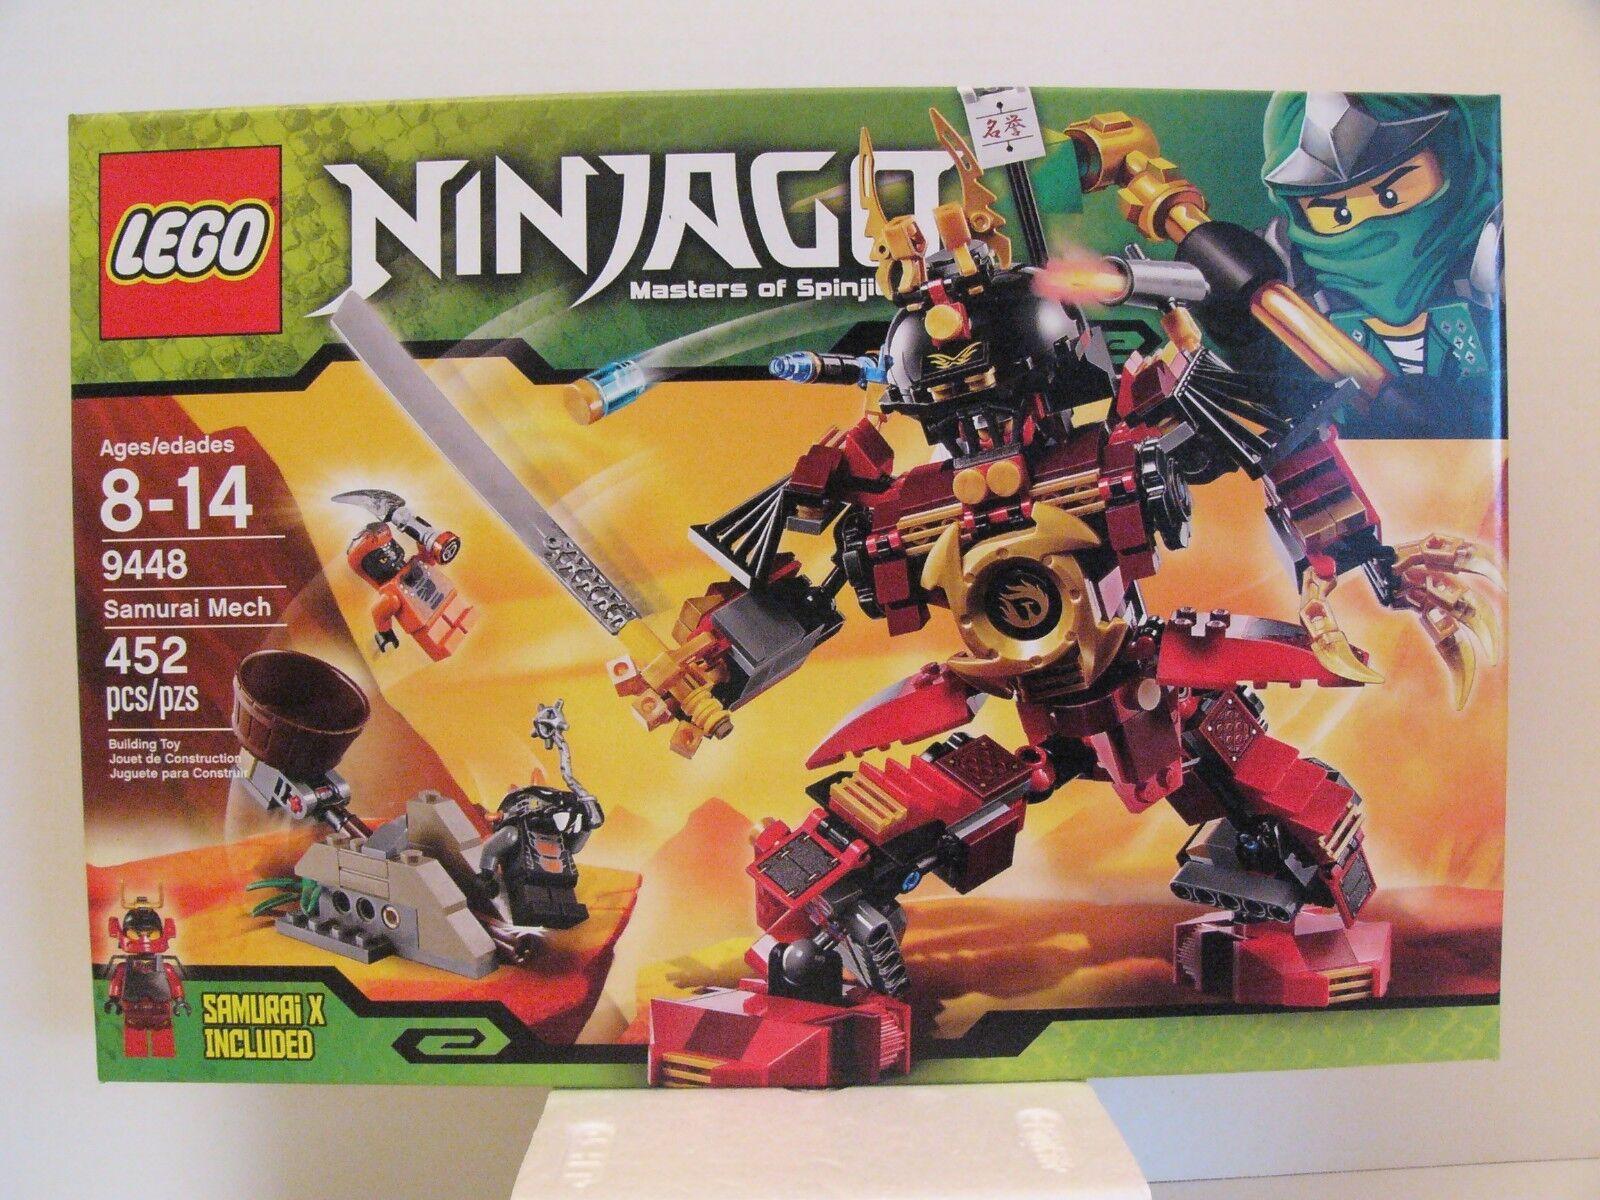 LEGO Ninjago 9448 Samurai Mech, Nuovo and Factory Sealed